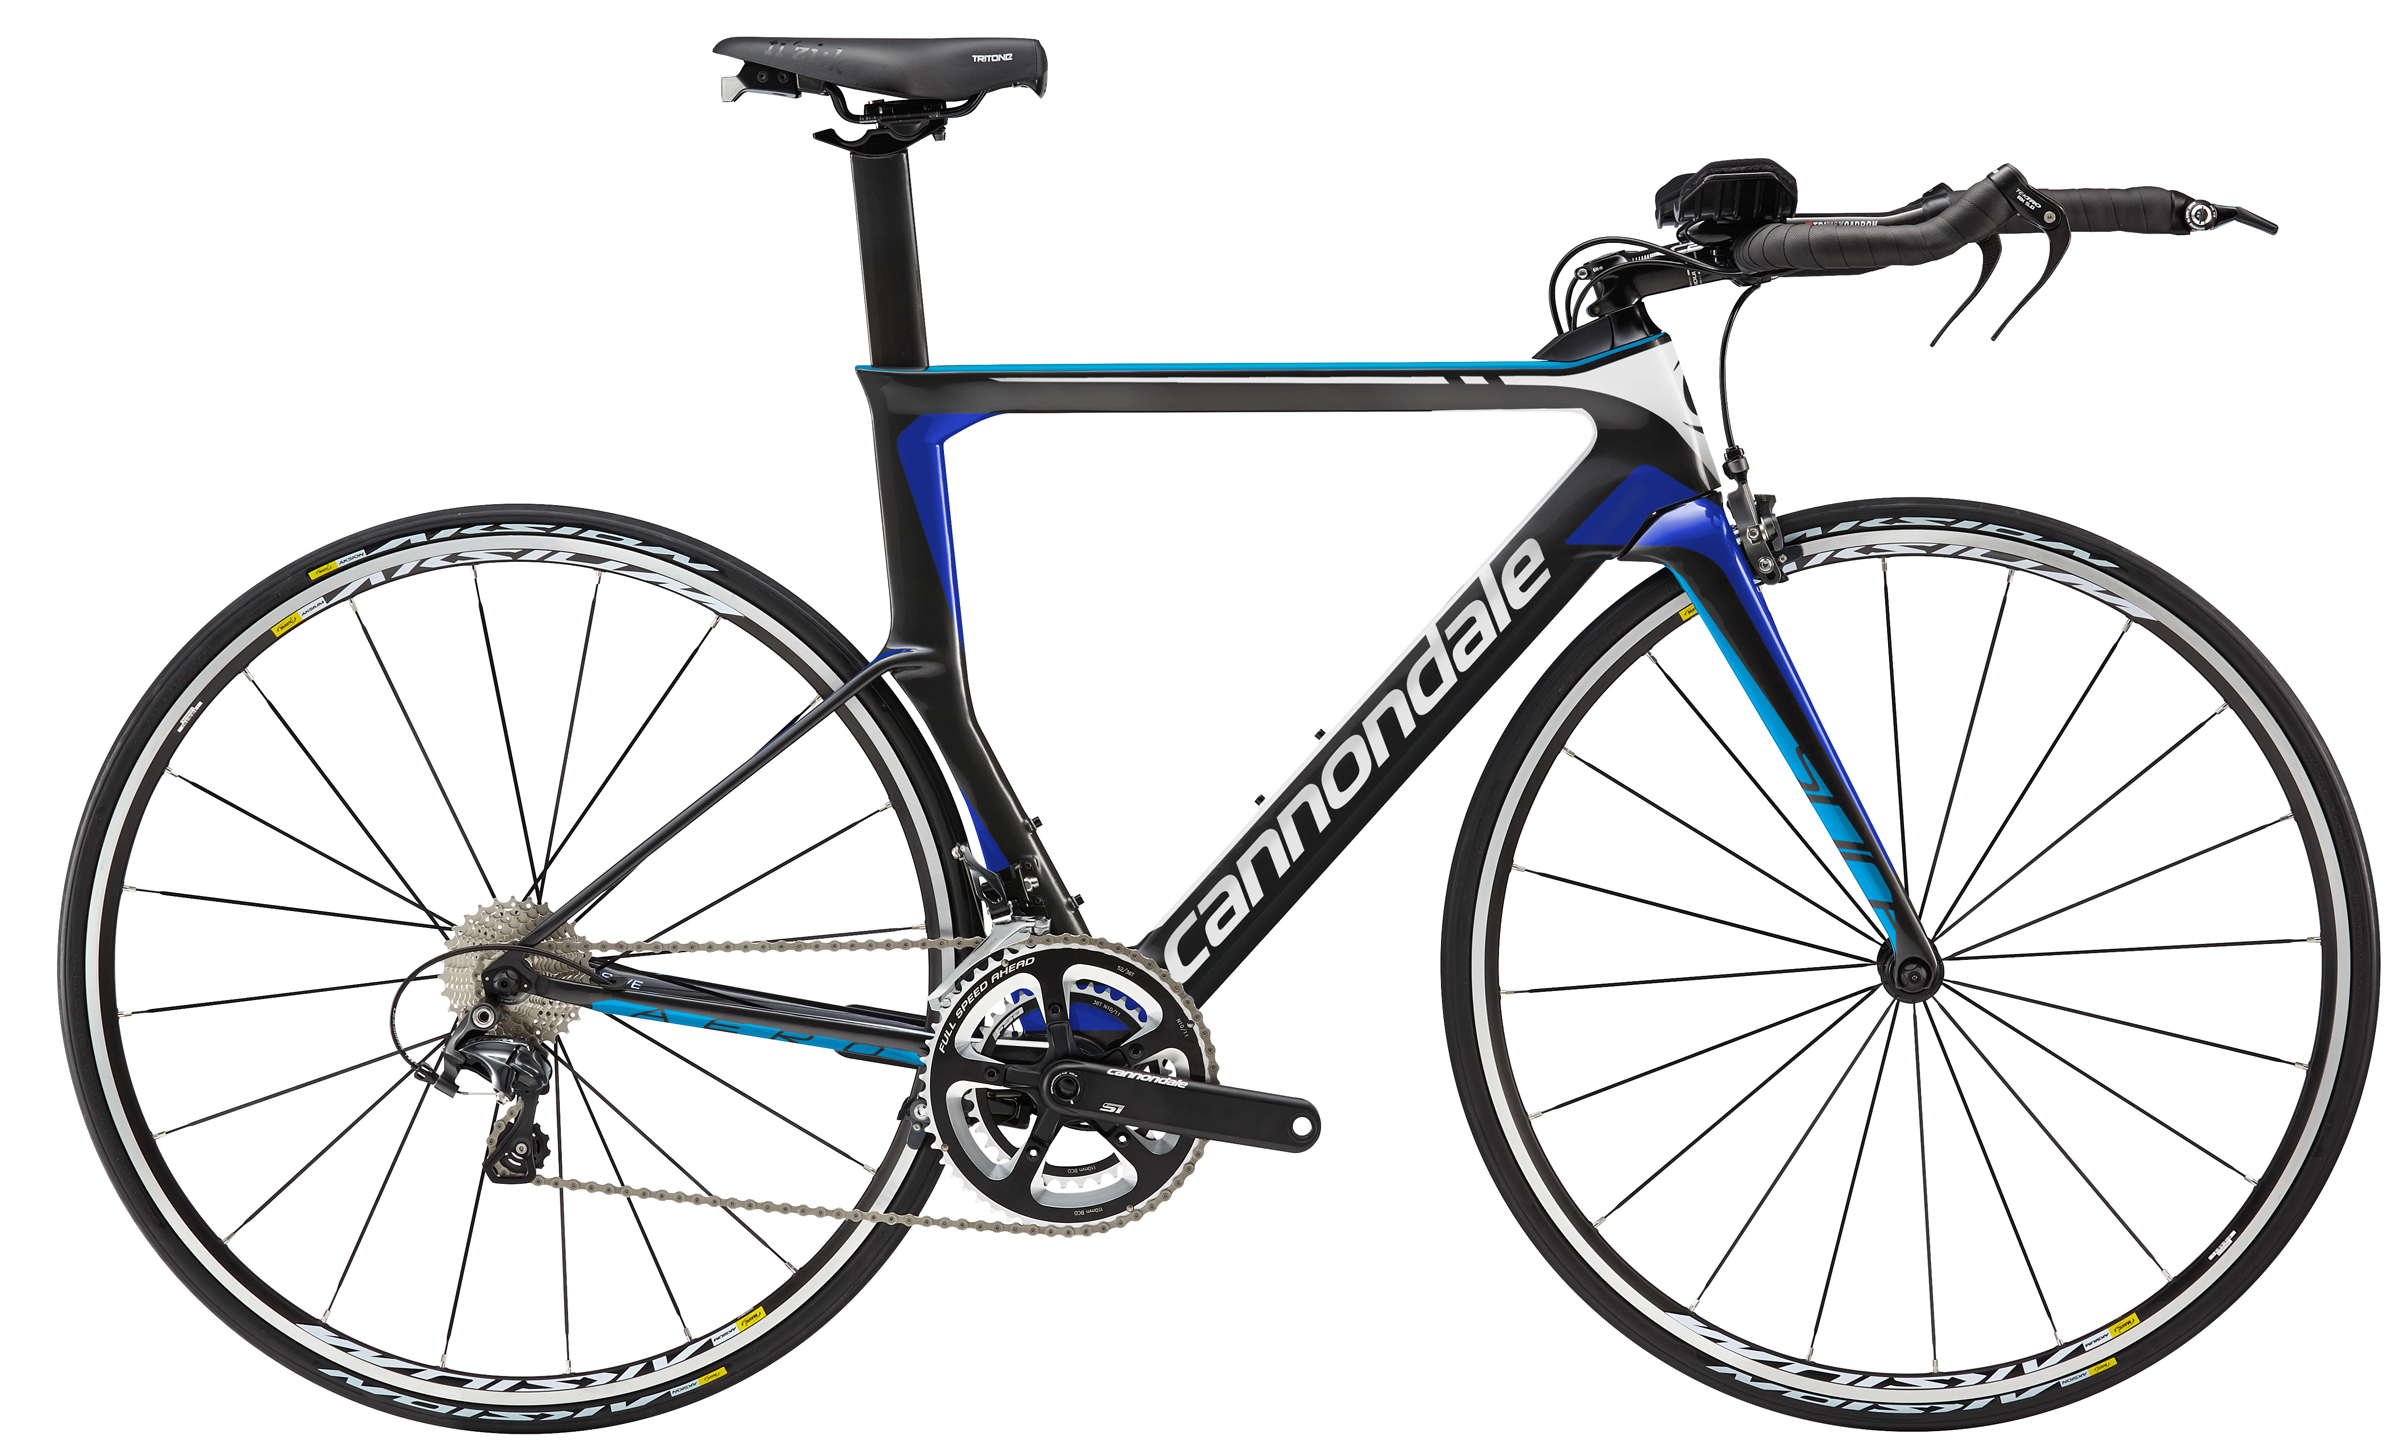 038bfba09fa Cannondale Slice Ultegra - The Newbury Park Bicycle Shop